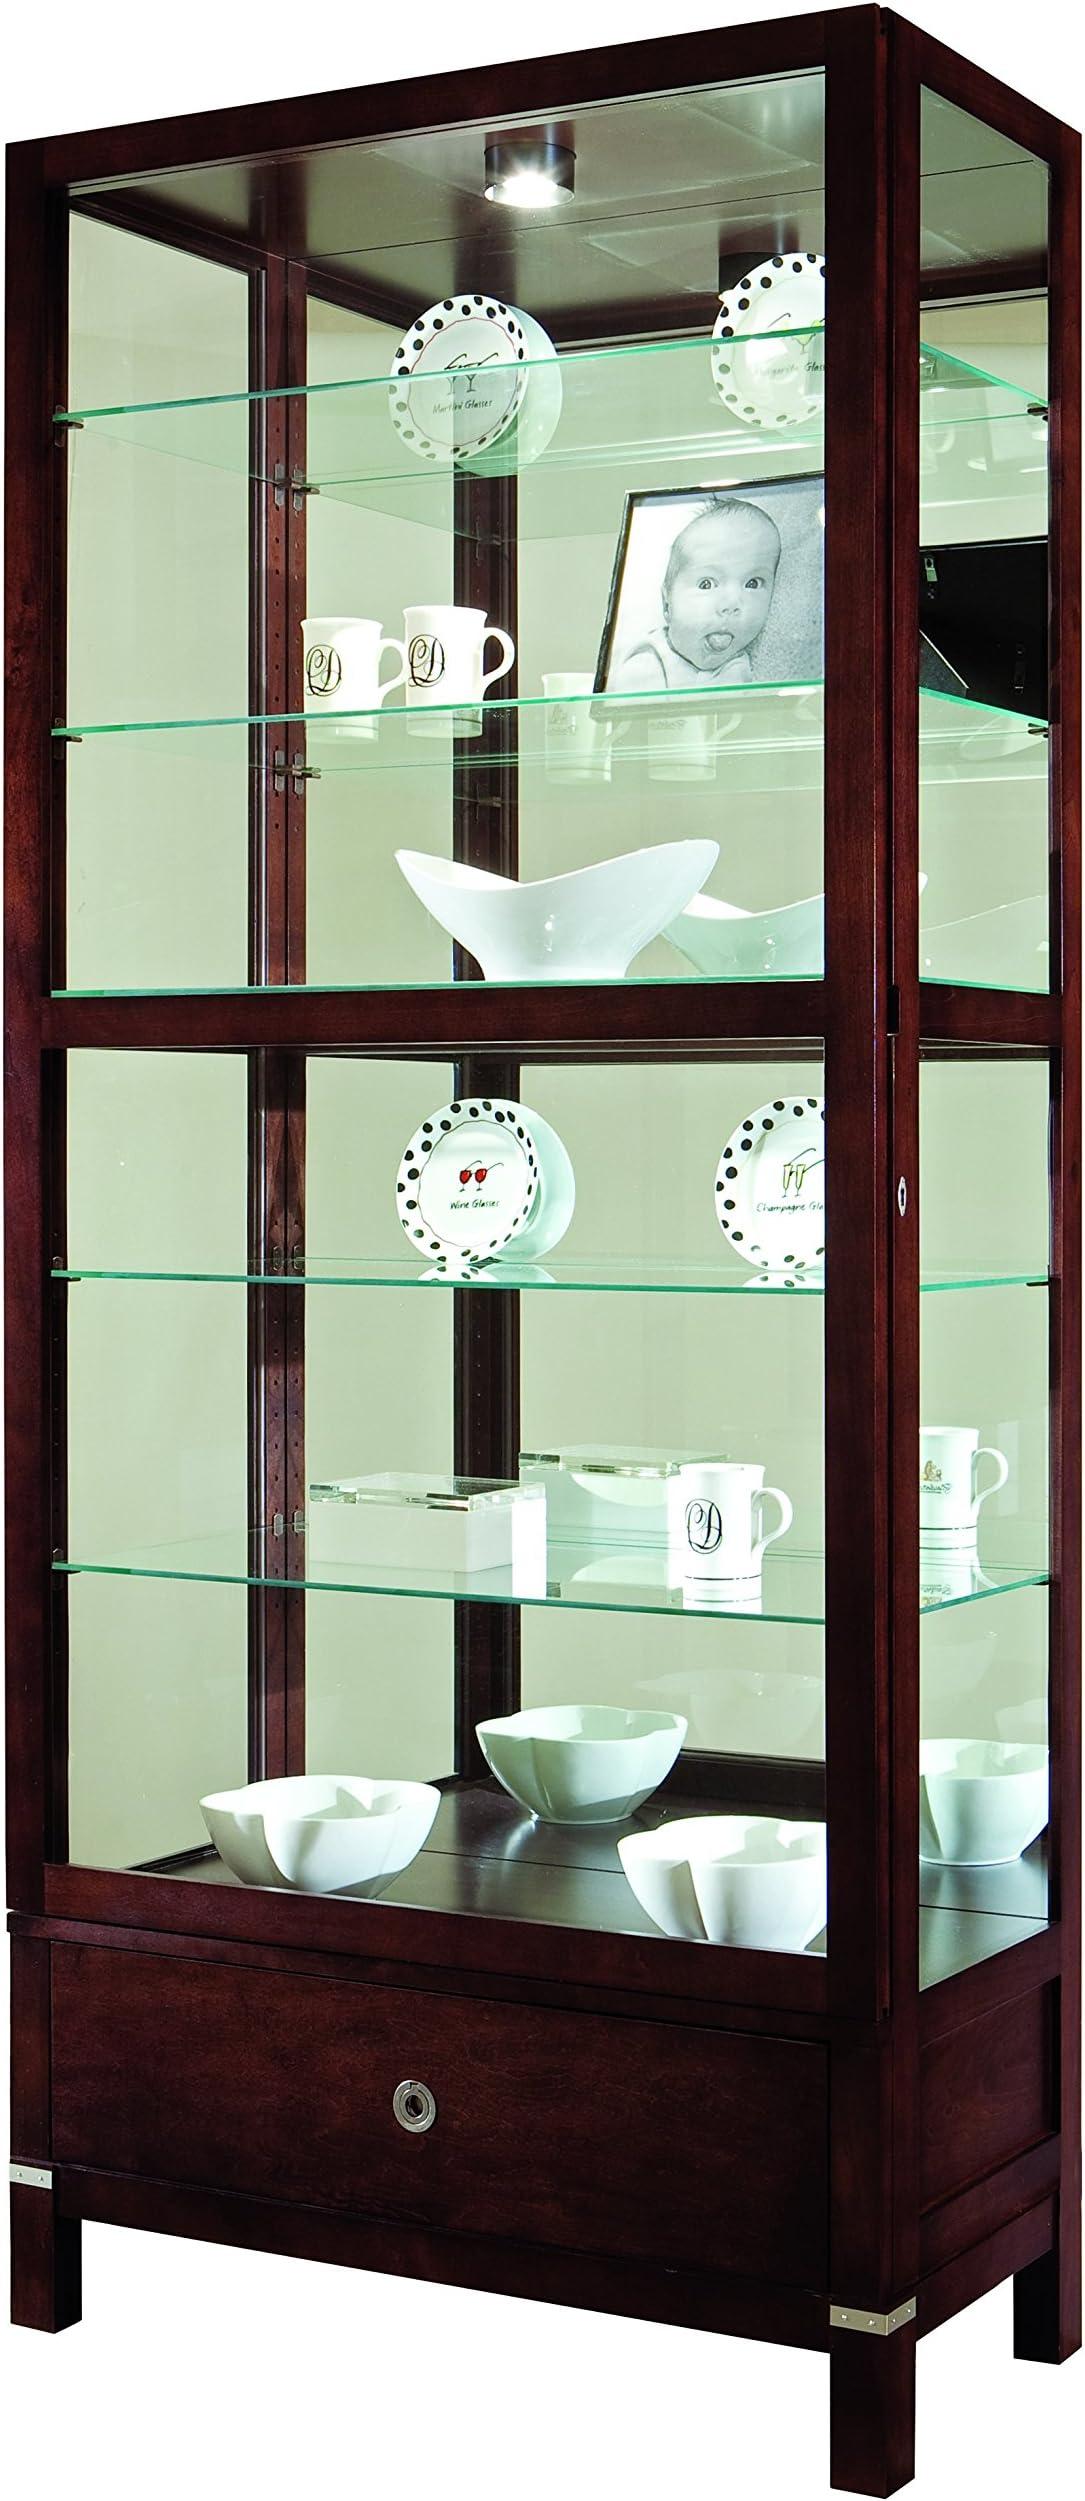 china cabinets amazon com prime med clinic cottage grove oregon